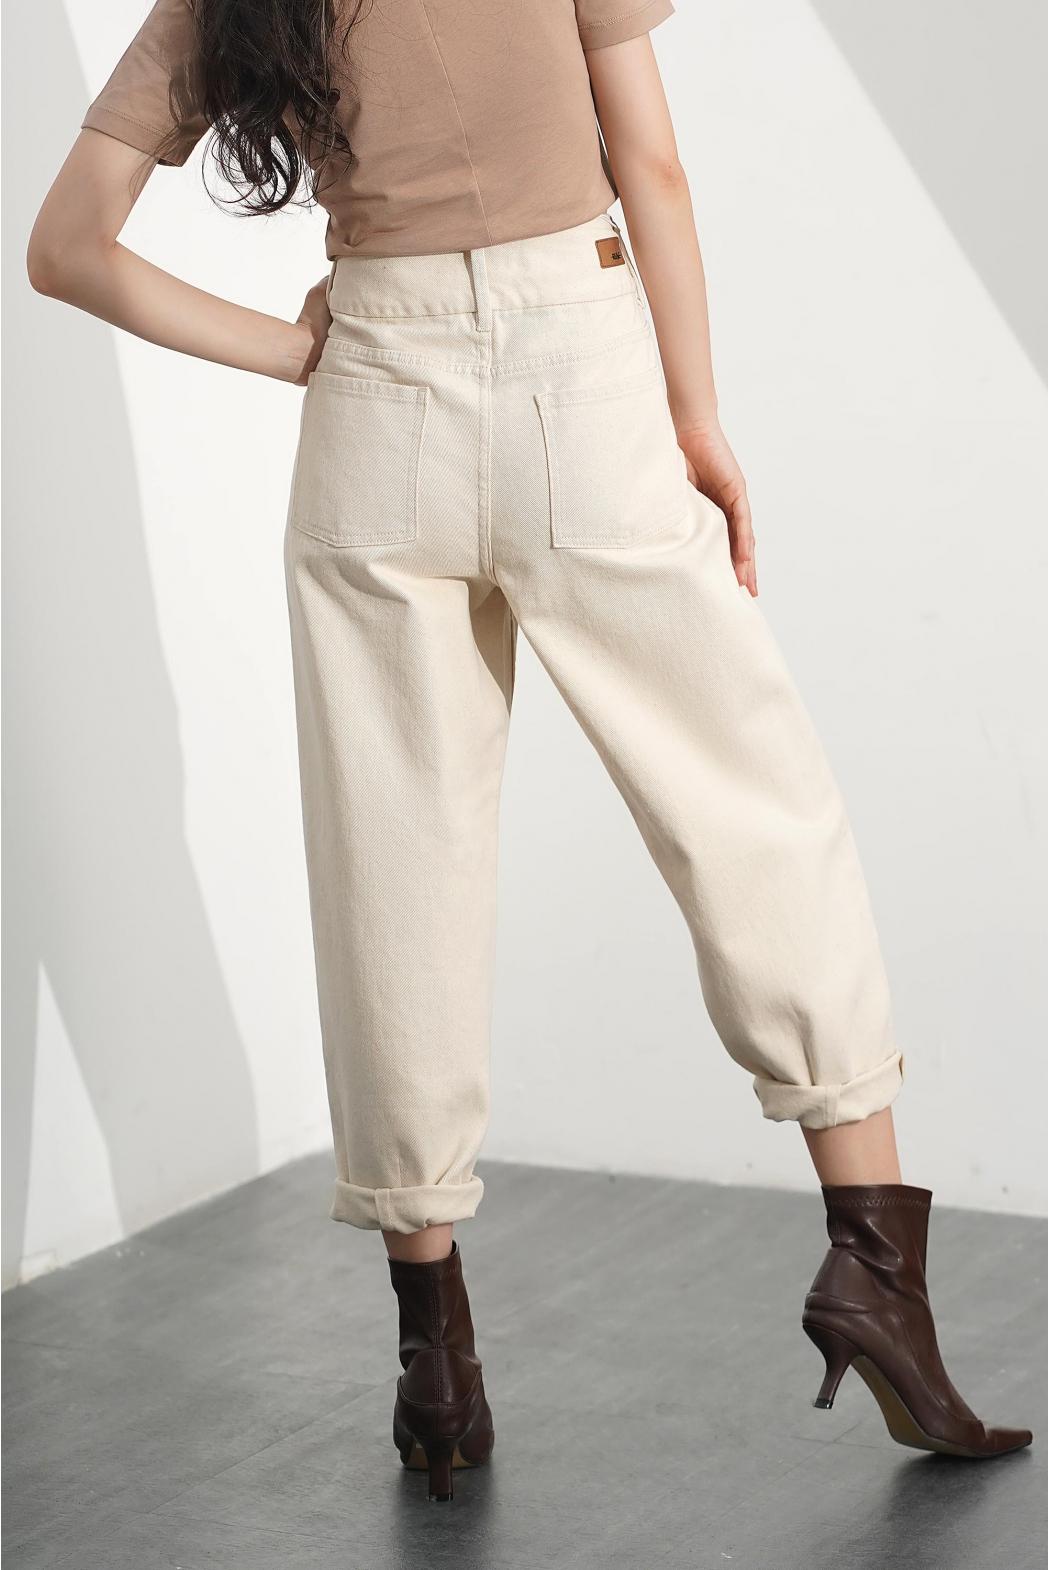 Quần Jean nữ lưng cao, xếp ly ống - 10F20DPAW011